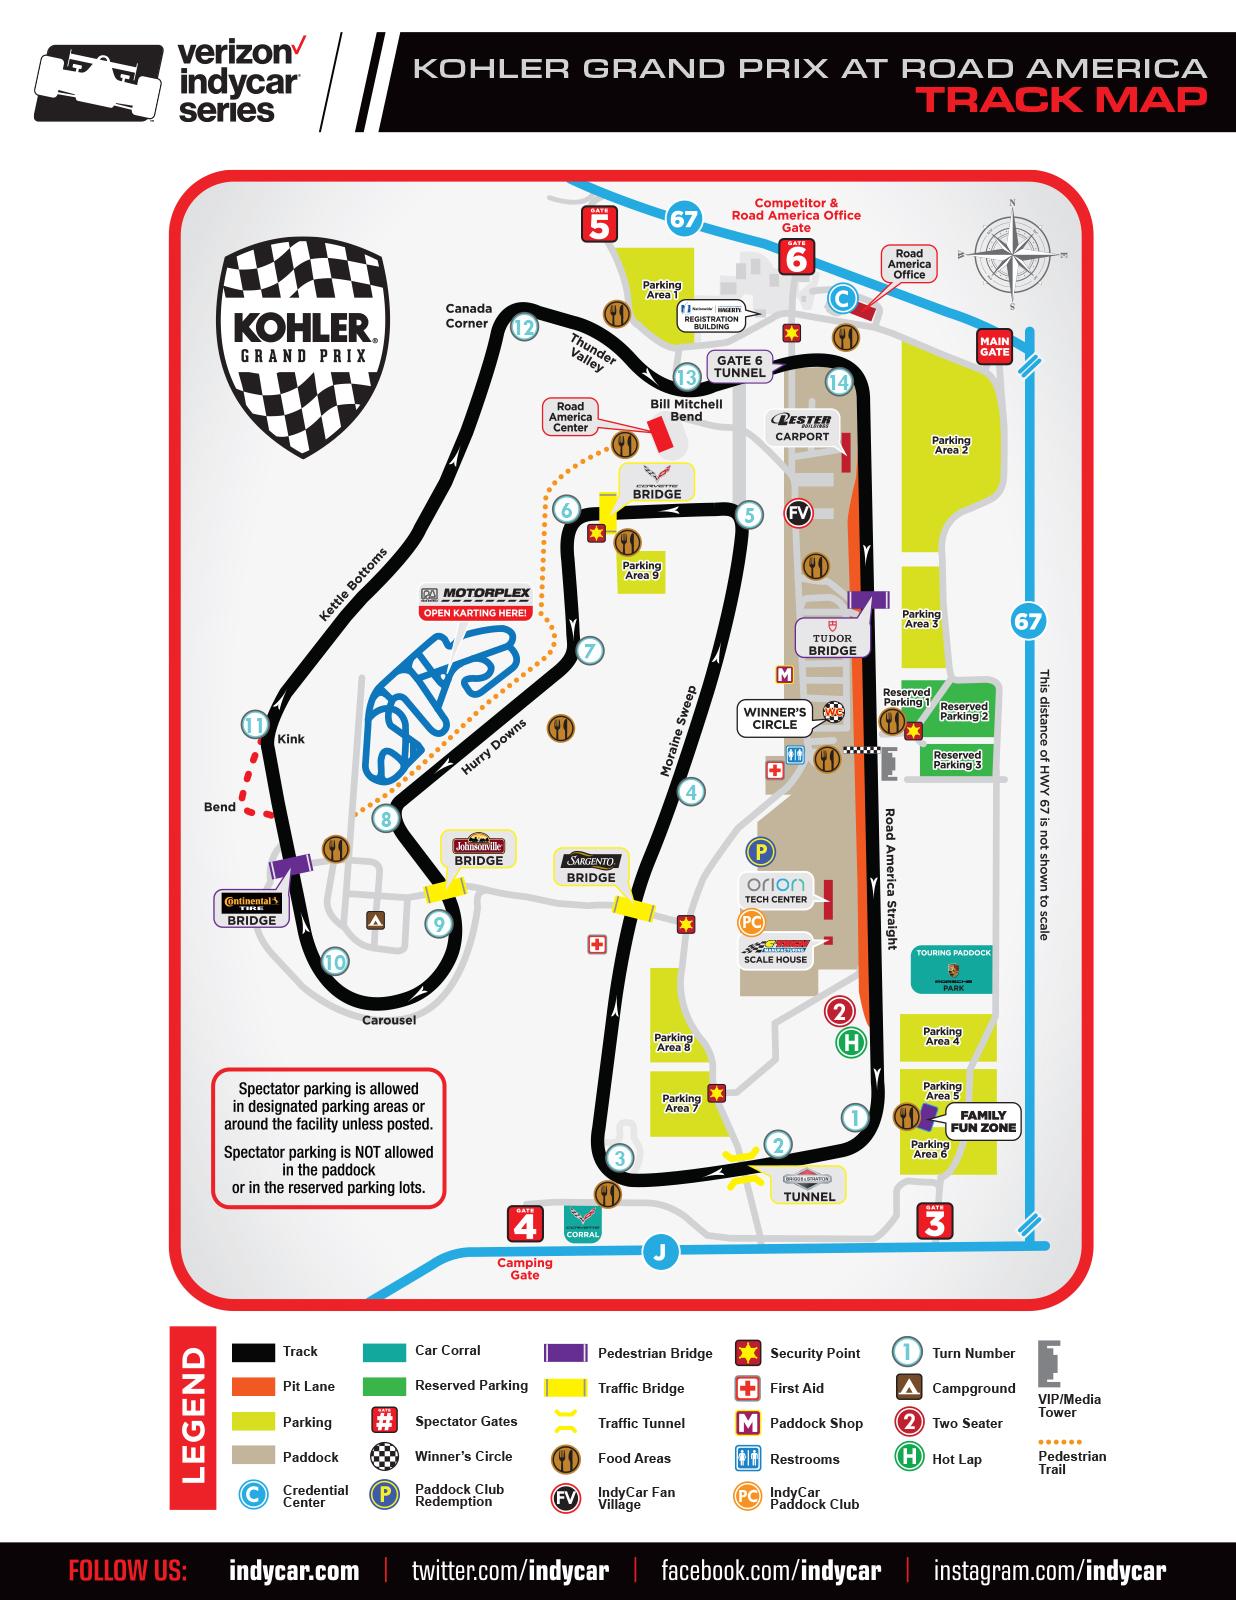 IndyCar: Vorschau Kohler Grand Prix at Road America – Racingblog